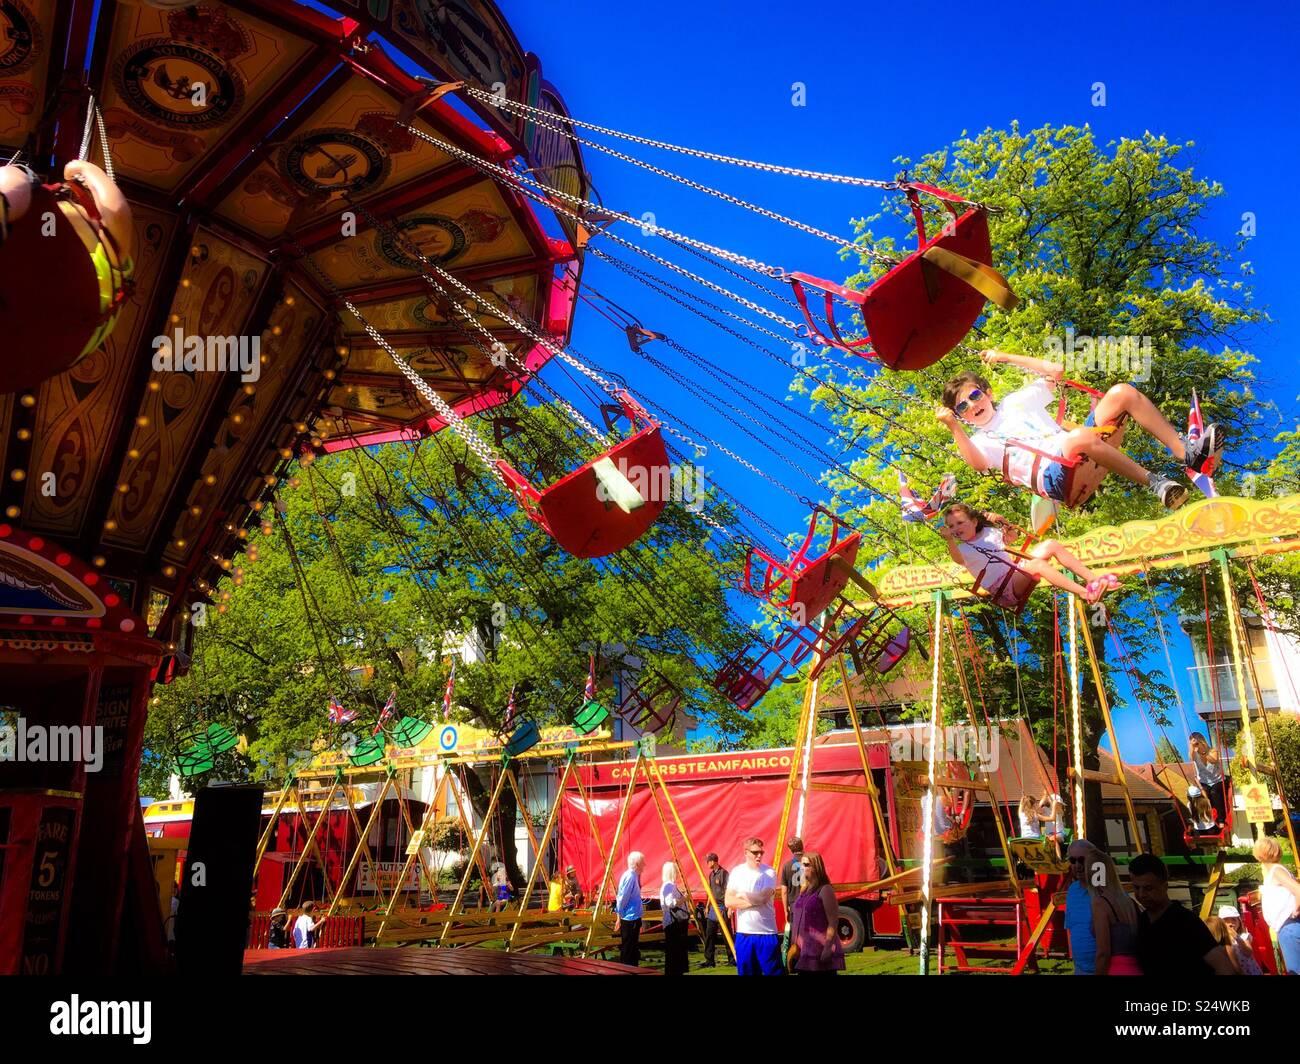 Swinging chairs merry go round - Stock Image